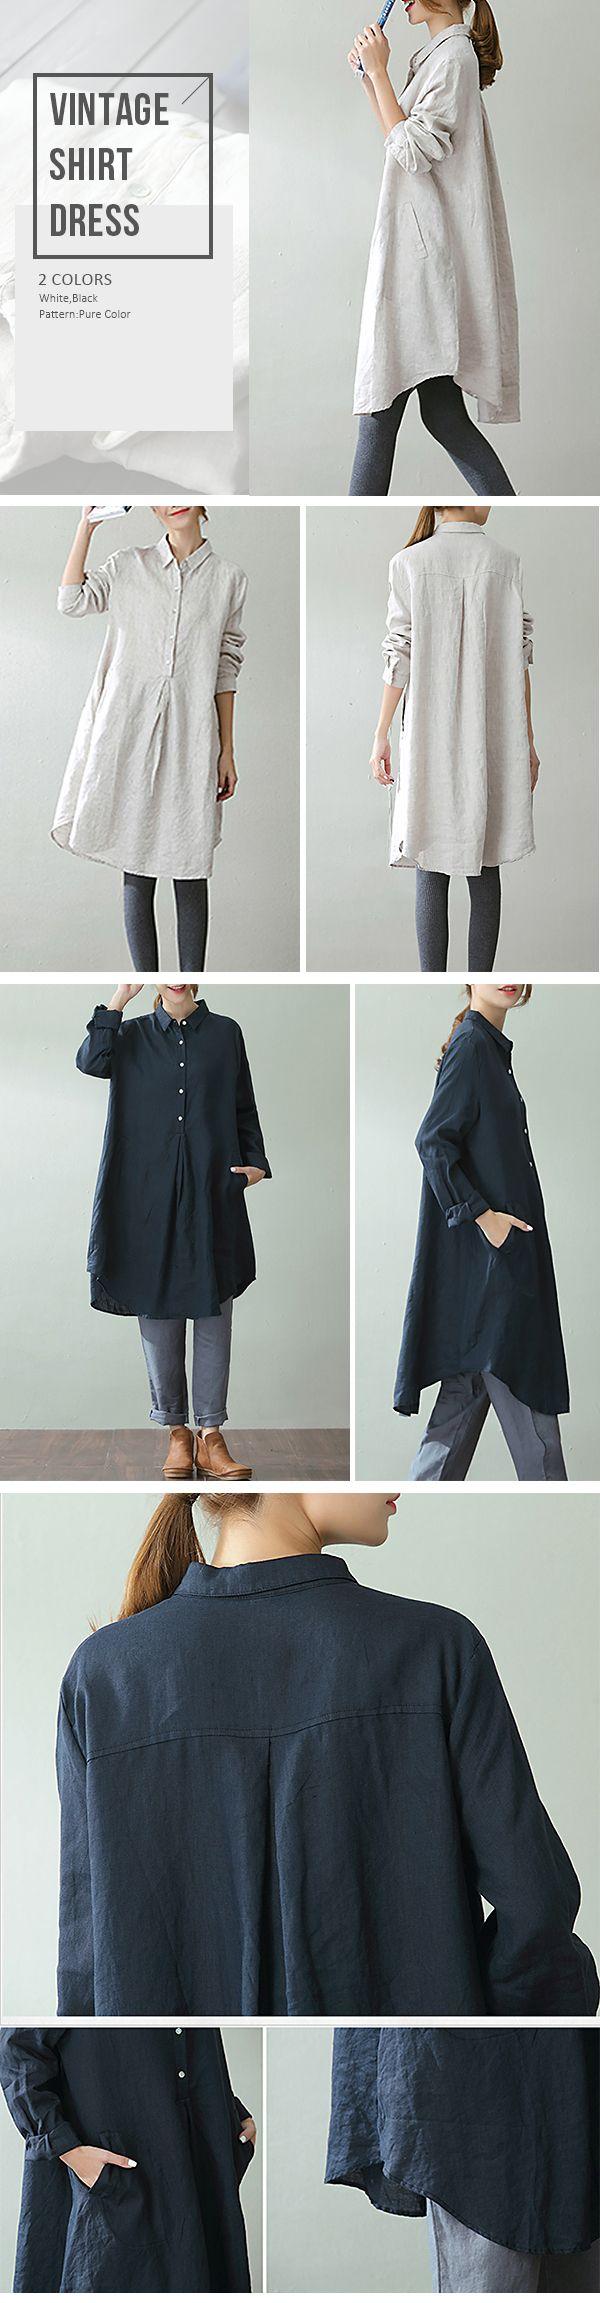 O-NEWE Vintage Lapel Pocket Shirt Dress For Women #fashion #style #art